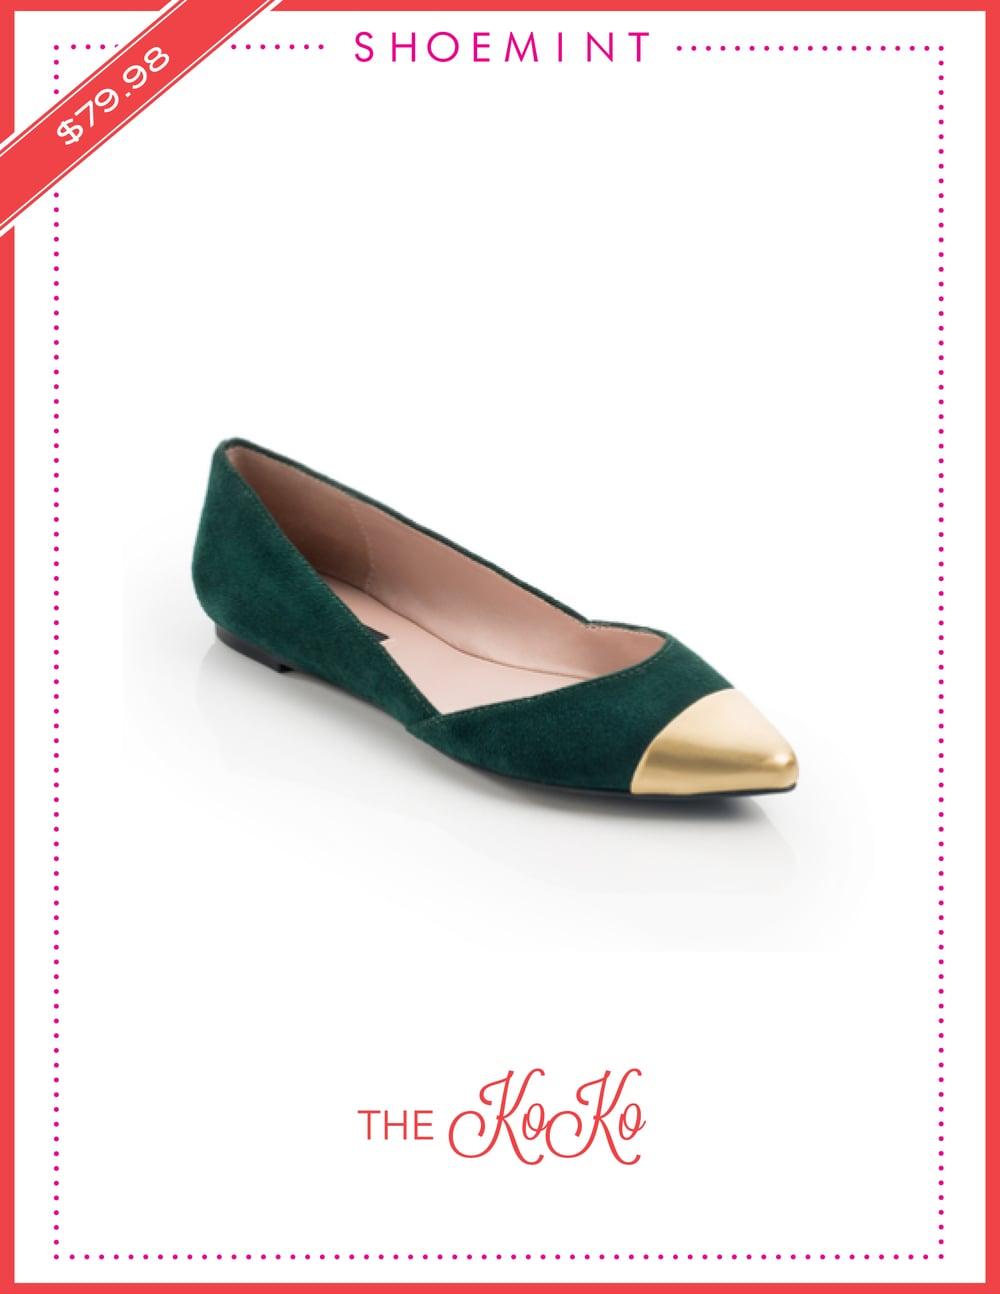 ShoeMintSlide-KoKo